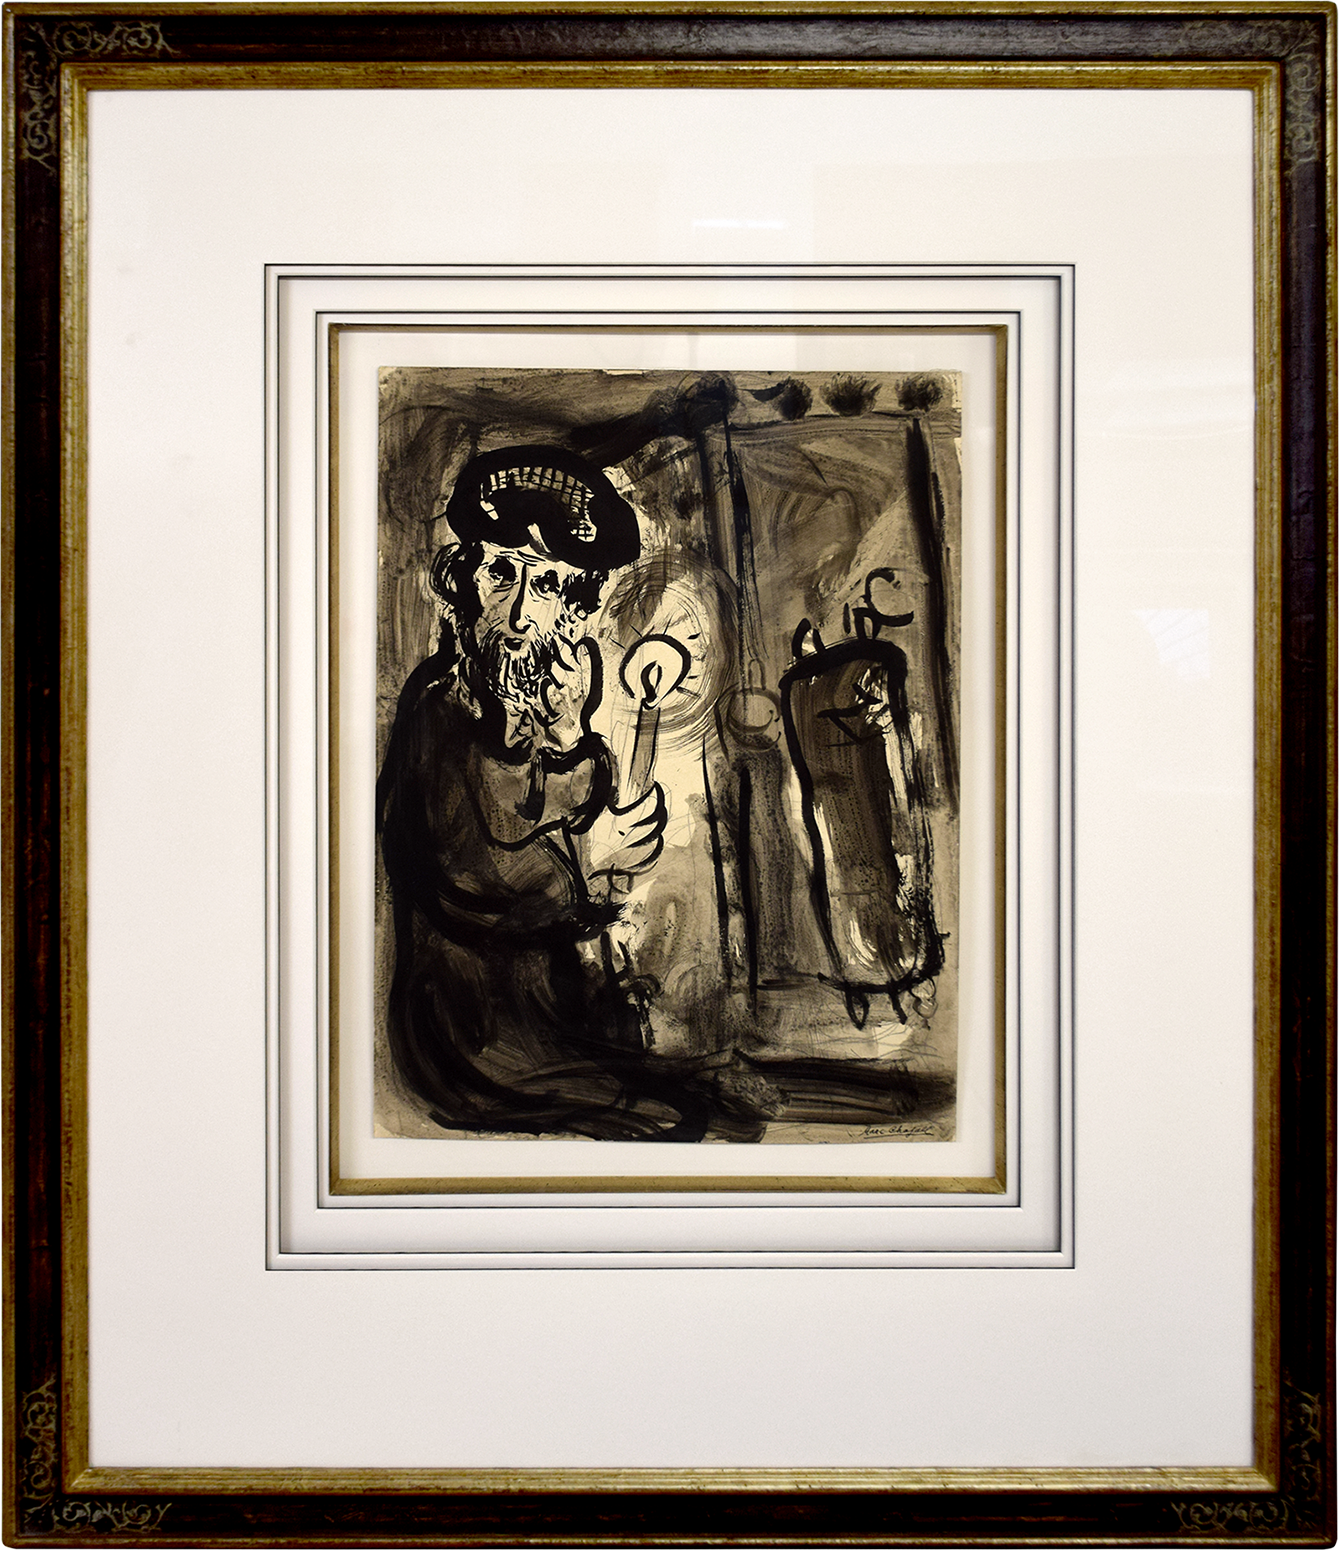 Marc Chagall - Der Rabbiner , 0610-012-007